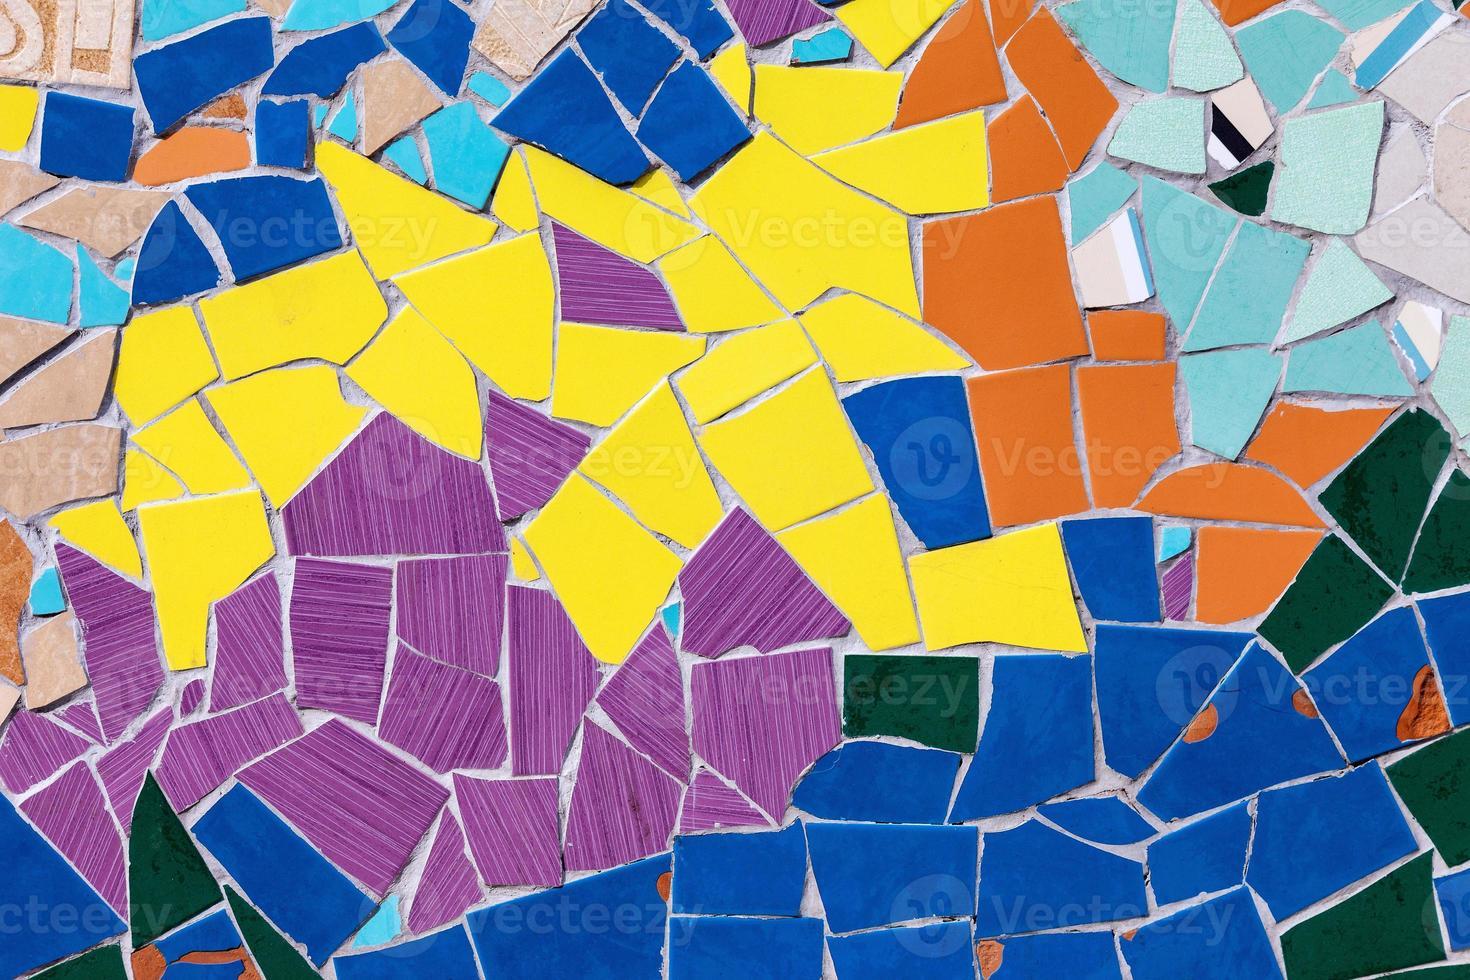 bunte Fliesen Mosaikkompositionsmuster des Keramikglases foto